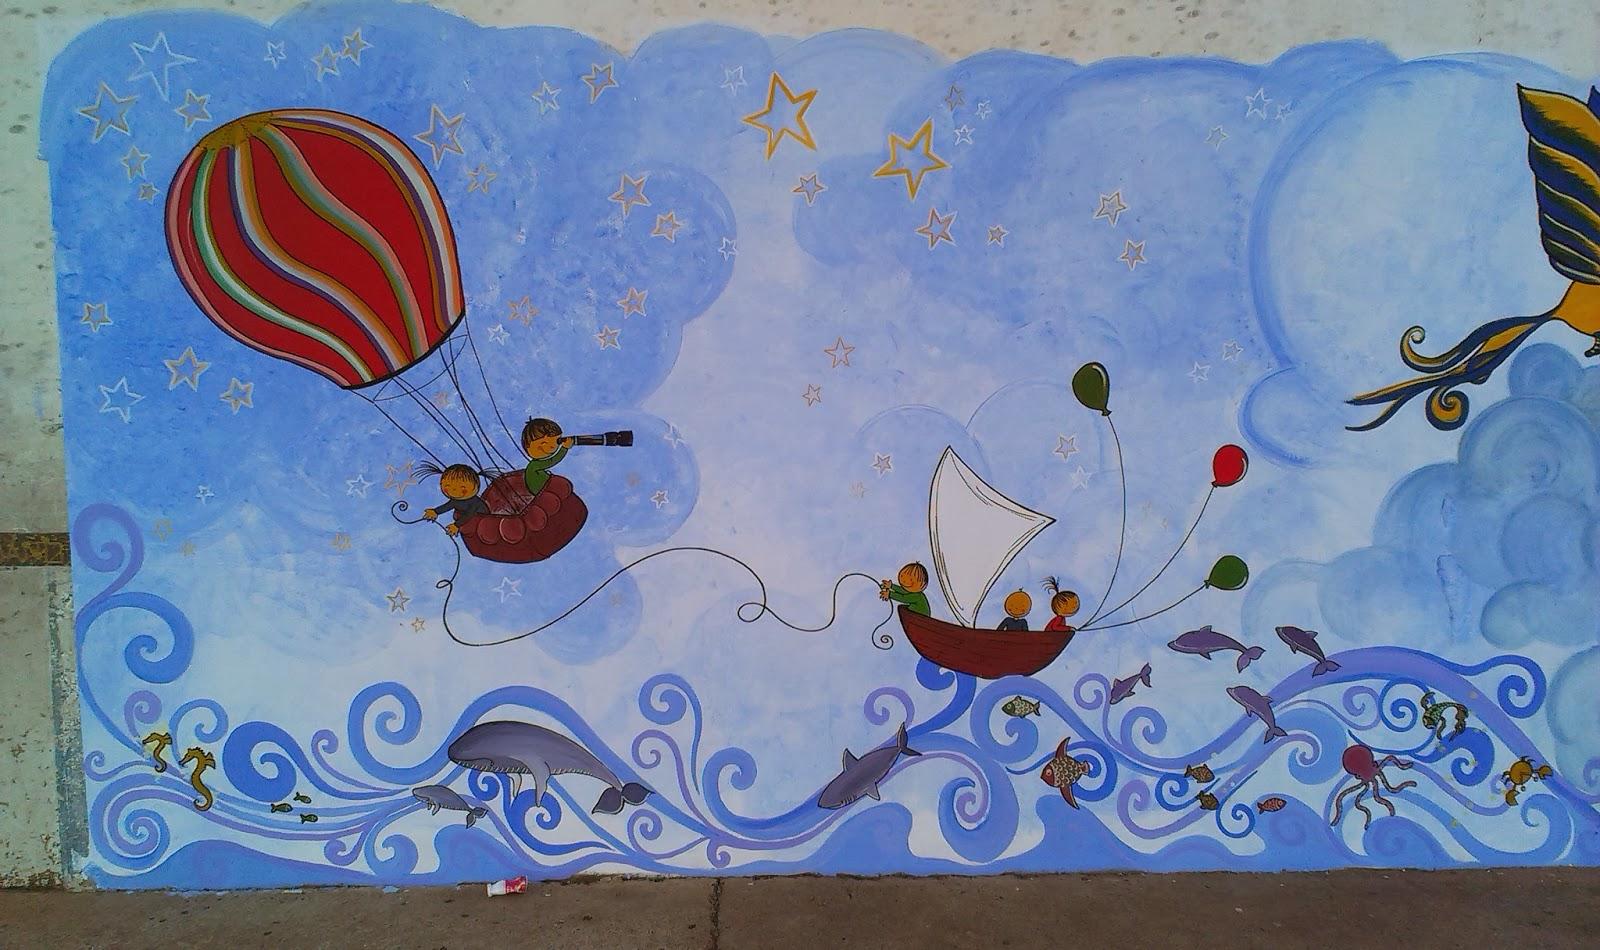 Pintura mural para ni os so ando despiertos susoleto for Murales decorativos para bebes